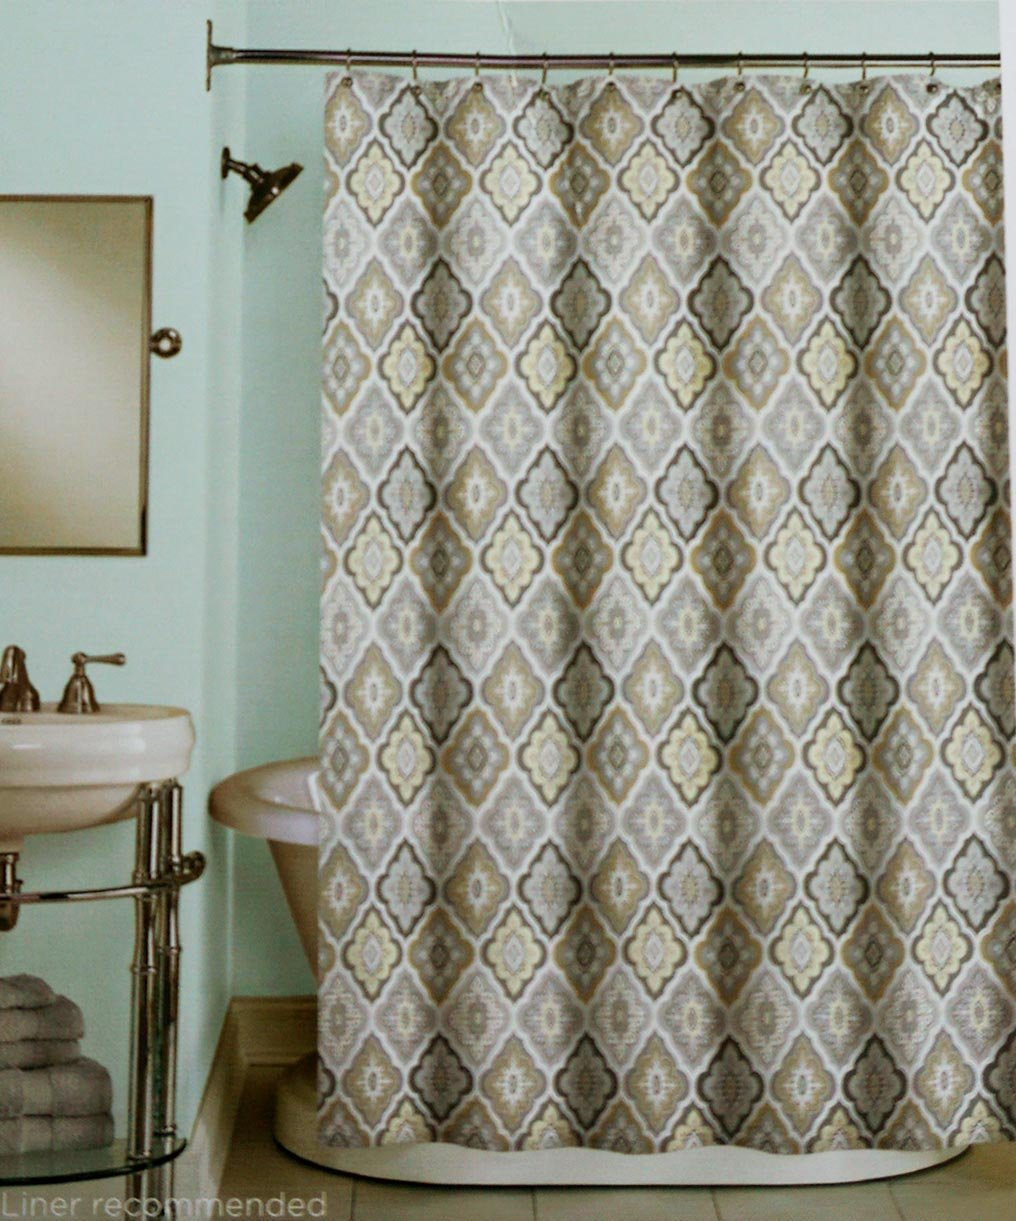 Amazon.com: Peri Fabric Shower Curtain Charcoal Beige Light Gray ...